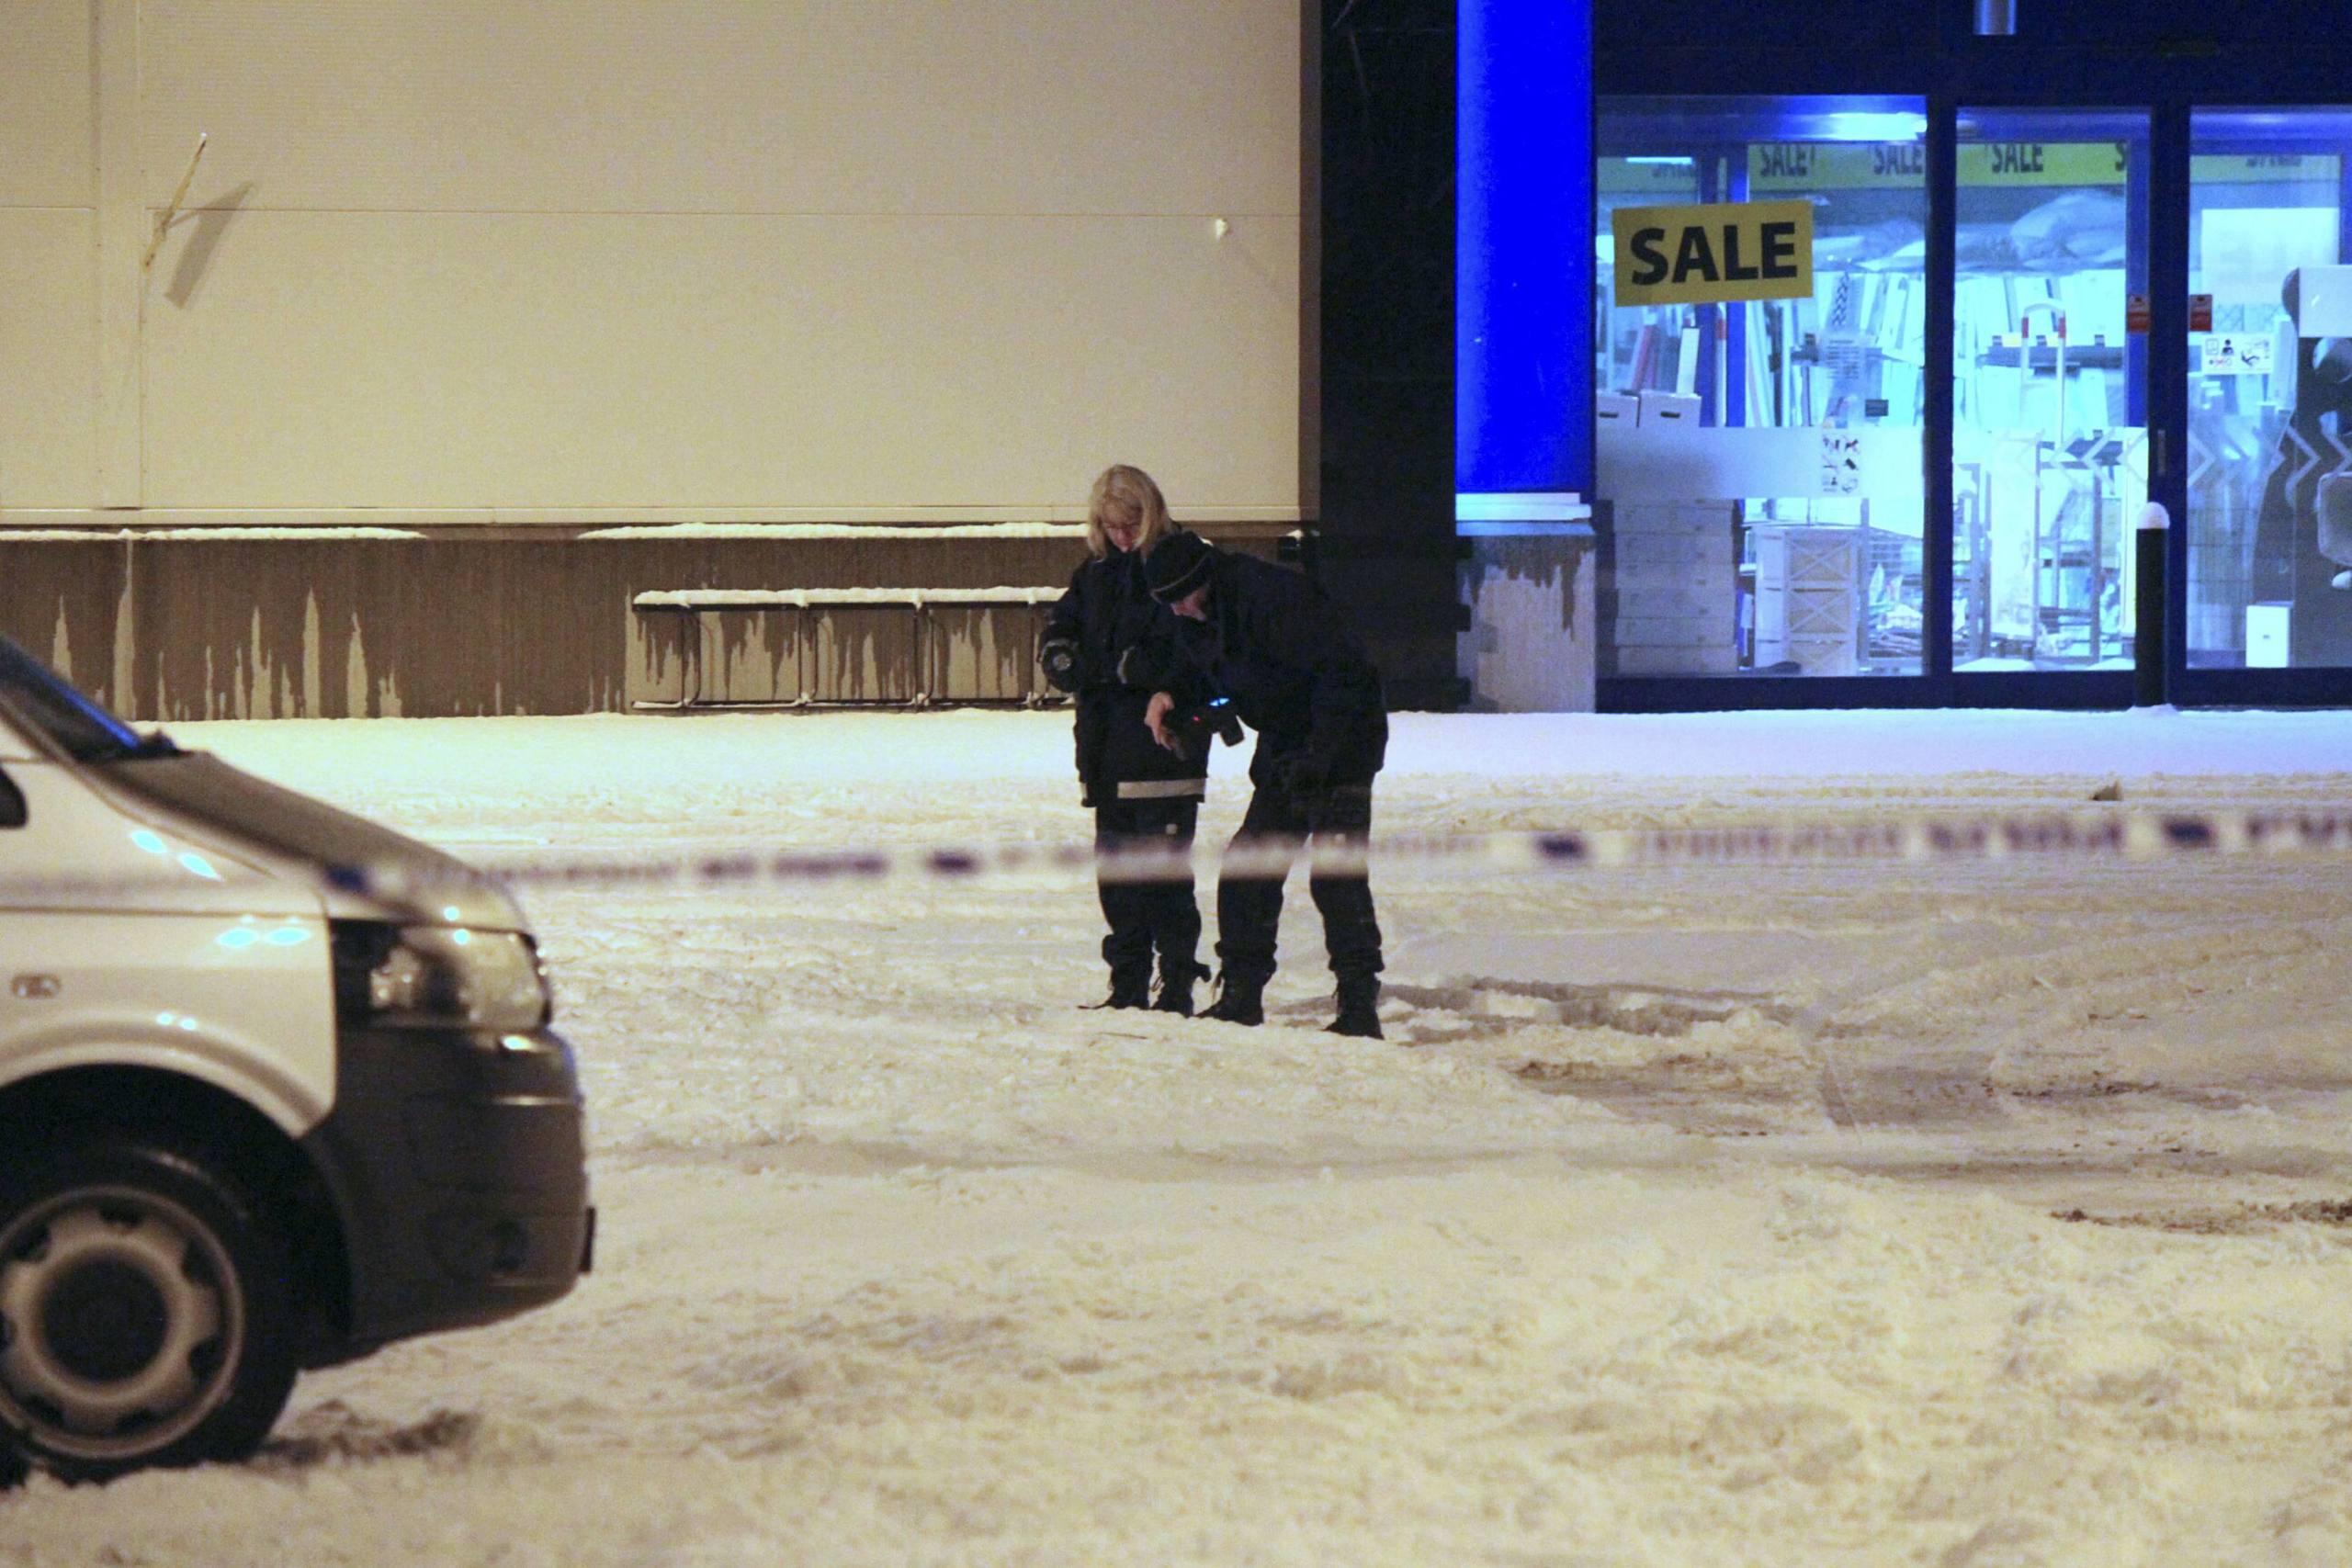 Polis kan sparkas efter atal om olaga tvang